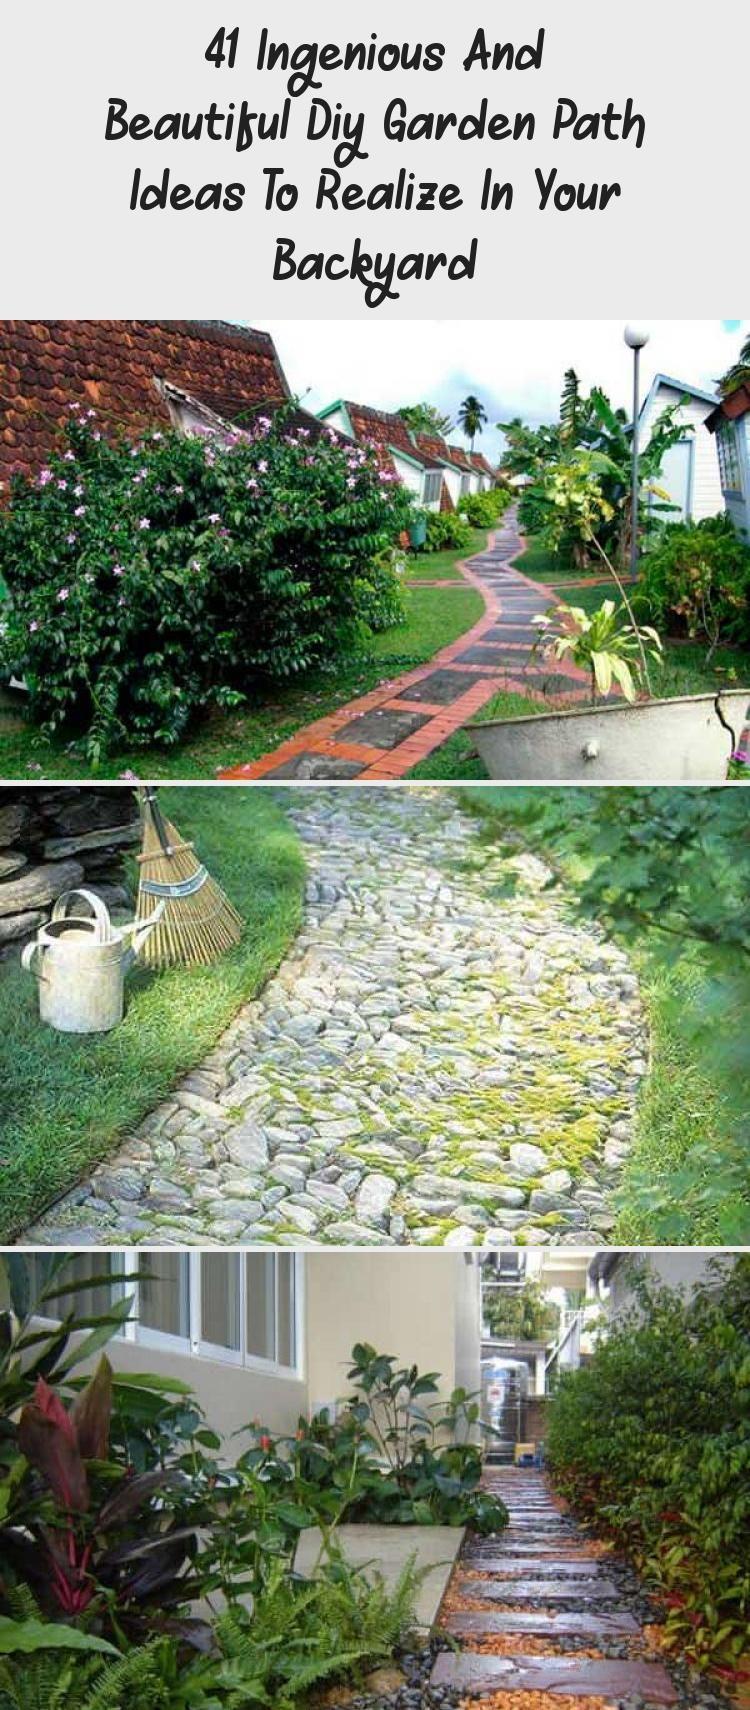 Photo of 41 Ingenious And Beautiful Diy Garden Path Ideas To Realize In Your Backyard – Pinokyo